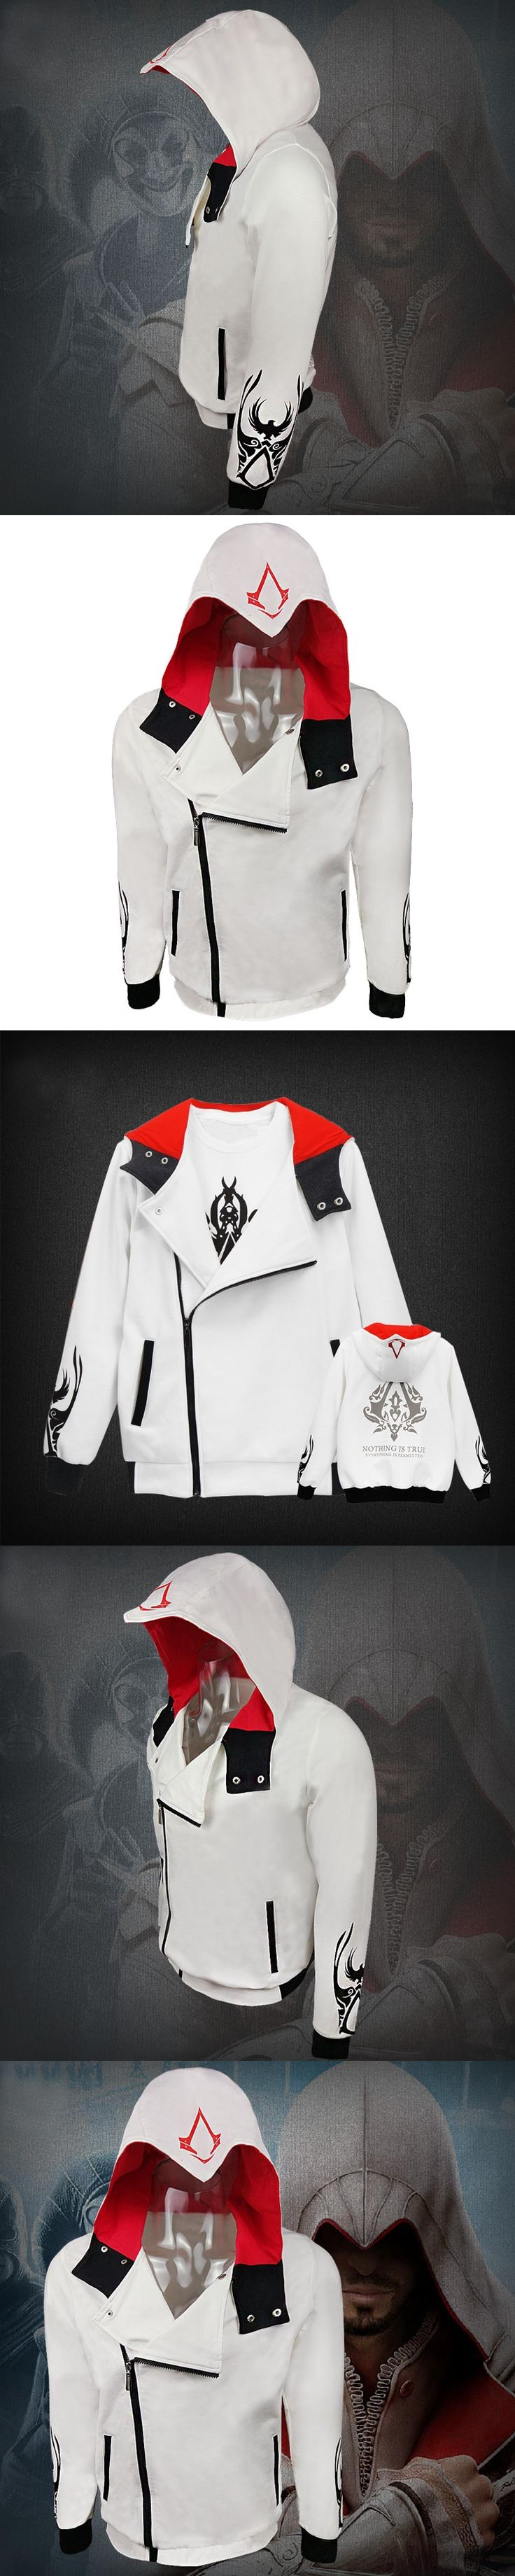 2017 New Arrival Assassins Creed Hoodies Men Sweatshirt Jackets Coat Cardigan Free Shipping